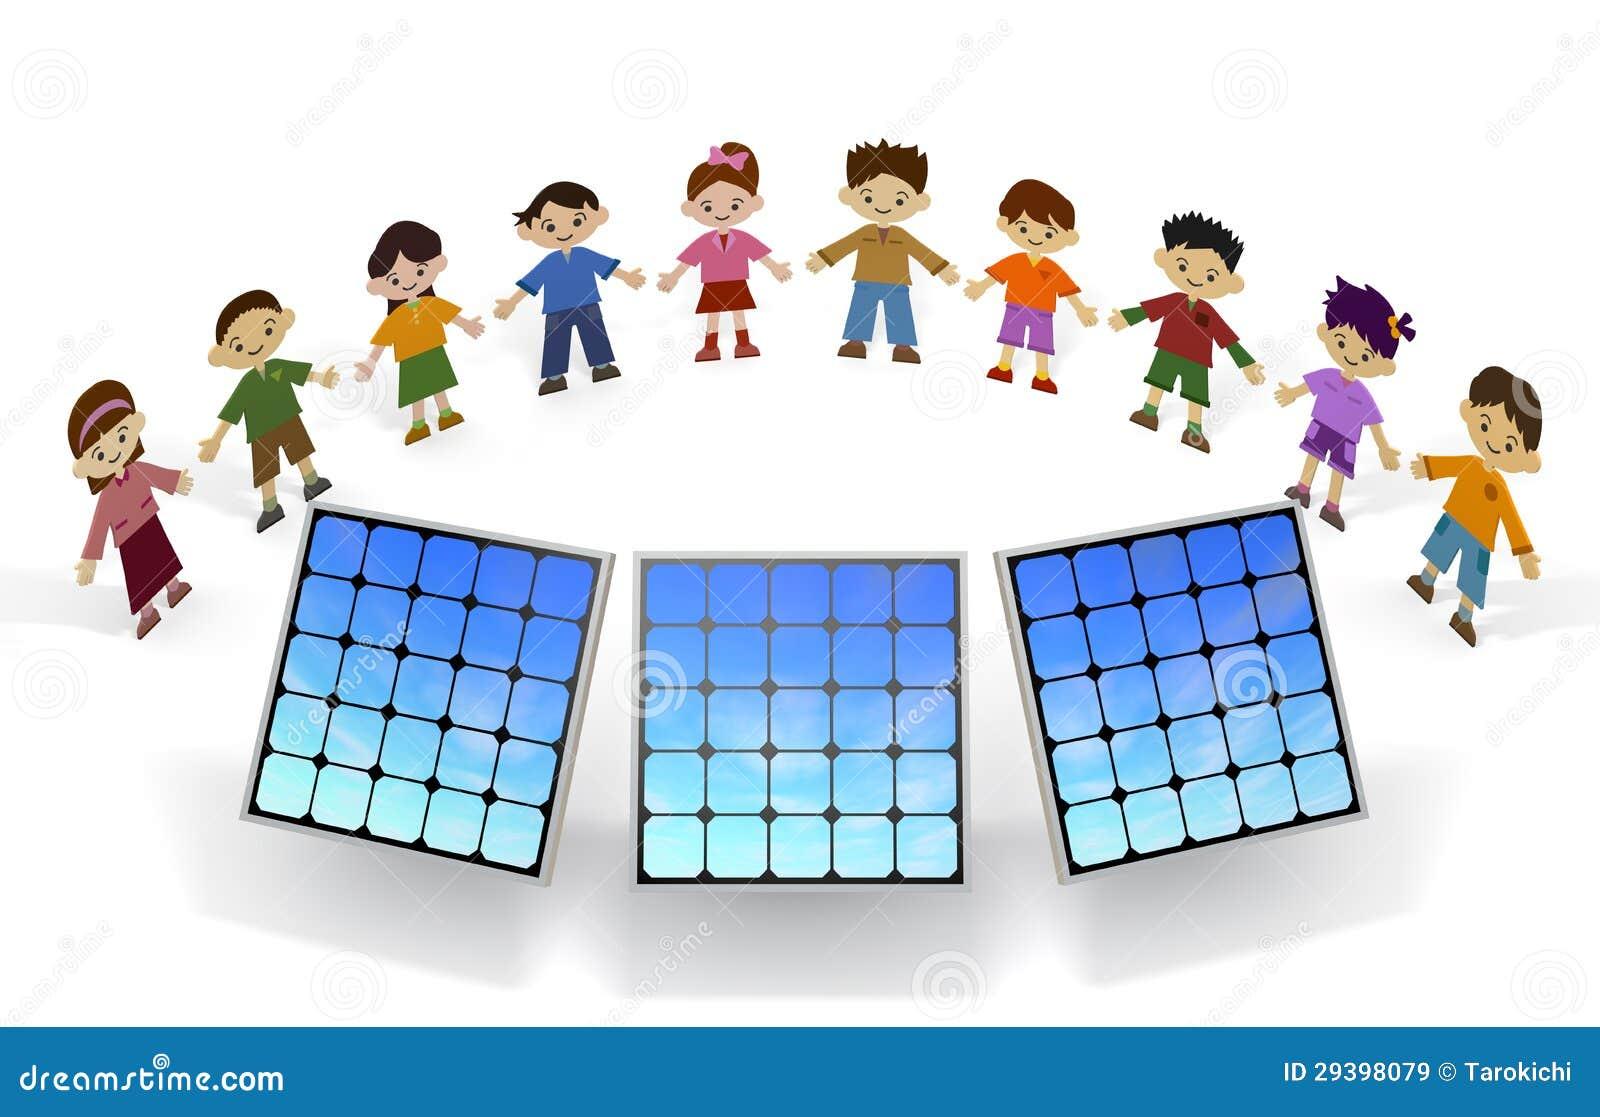 Children solar panels royalty free stock images image for Solar panels information for kids